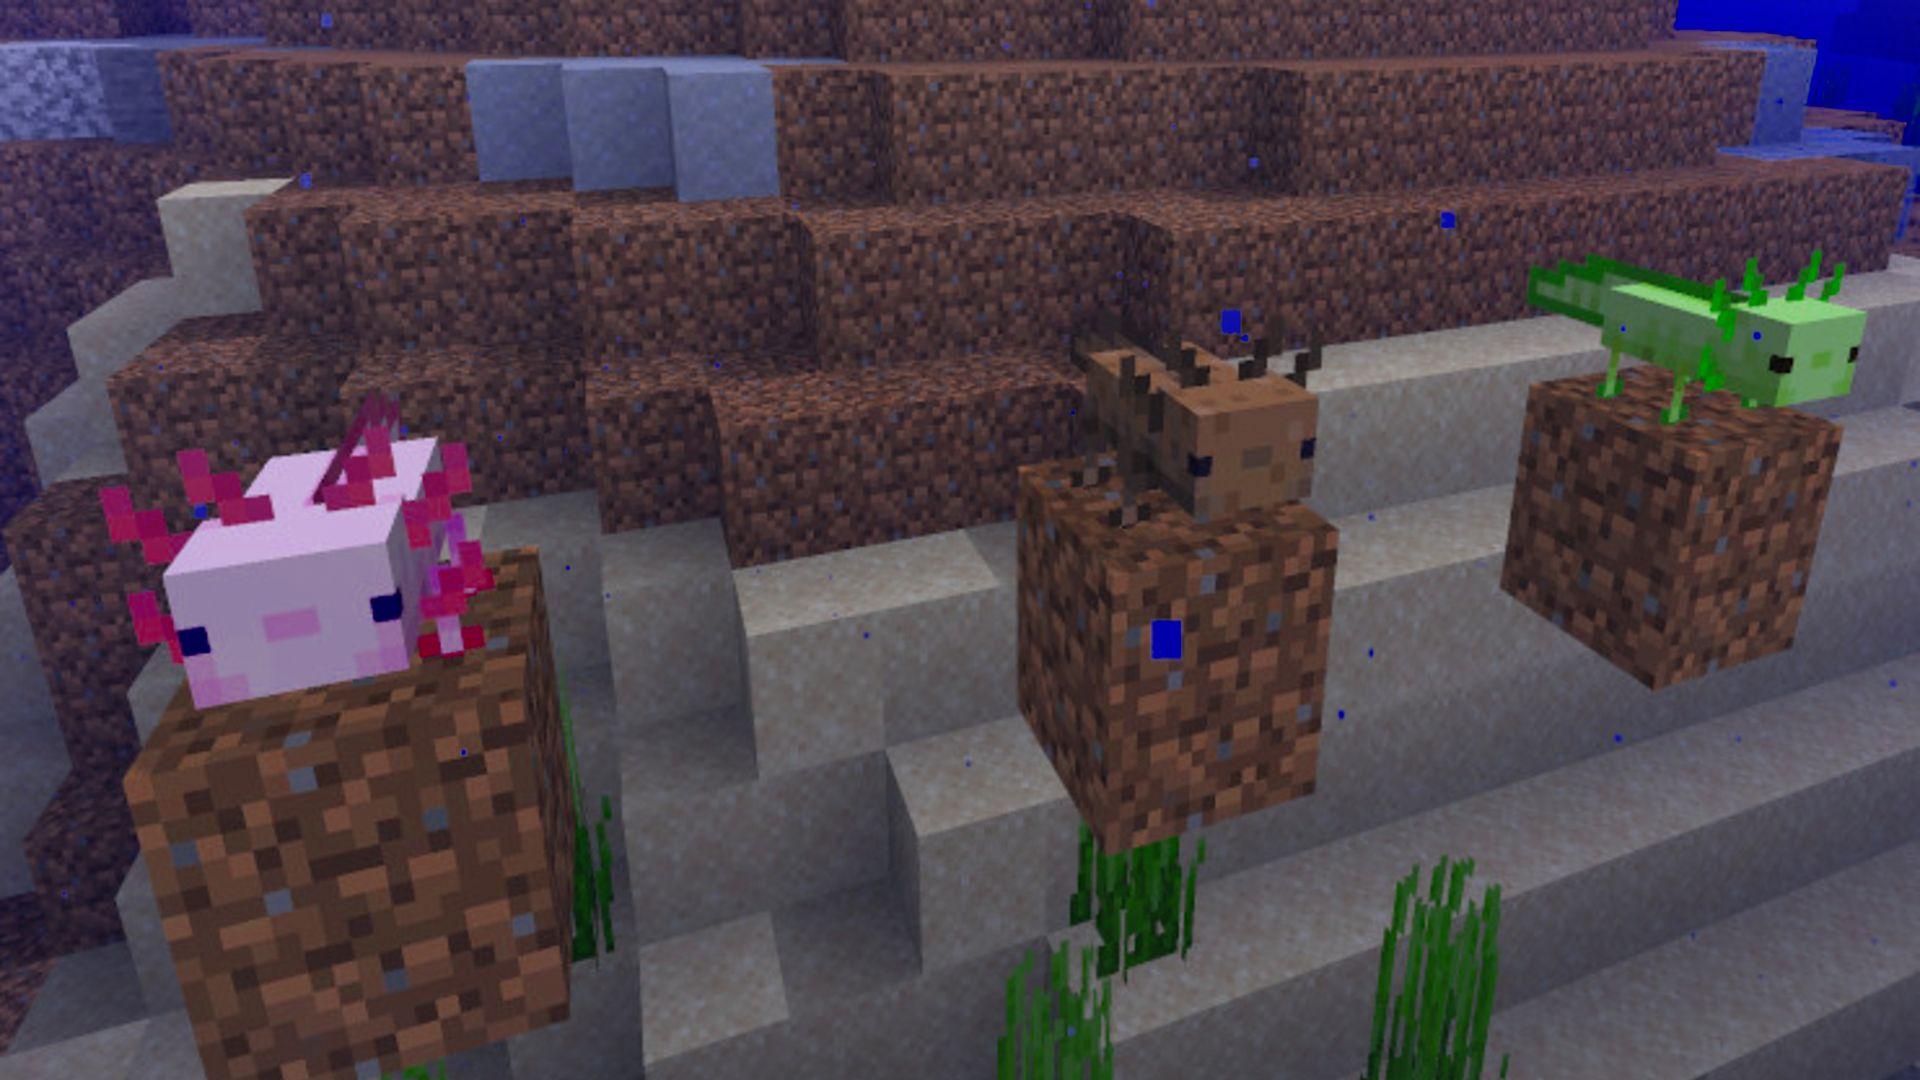 Minecraft Axolotl – everything we know